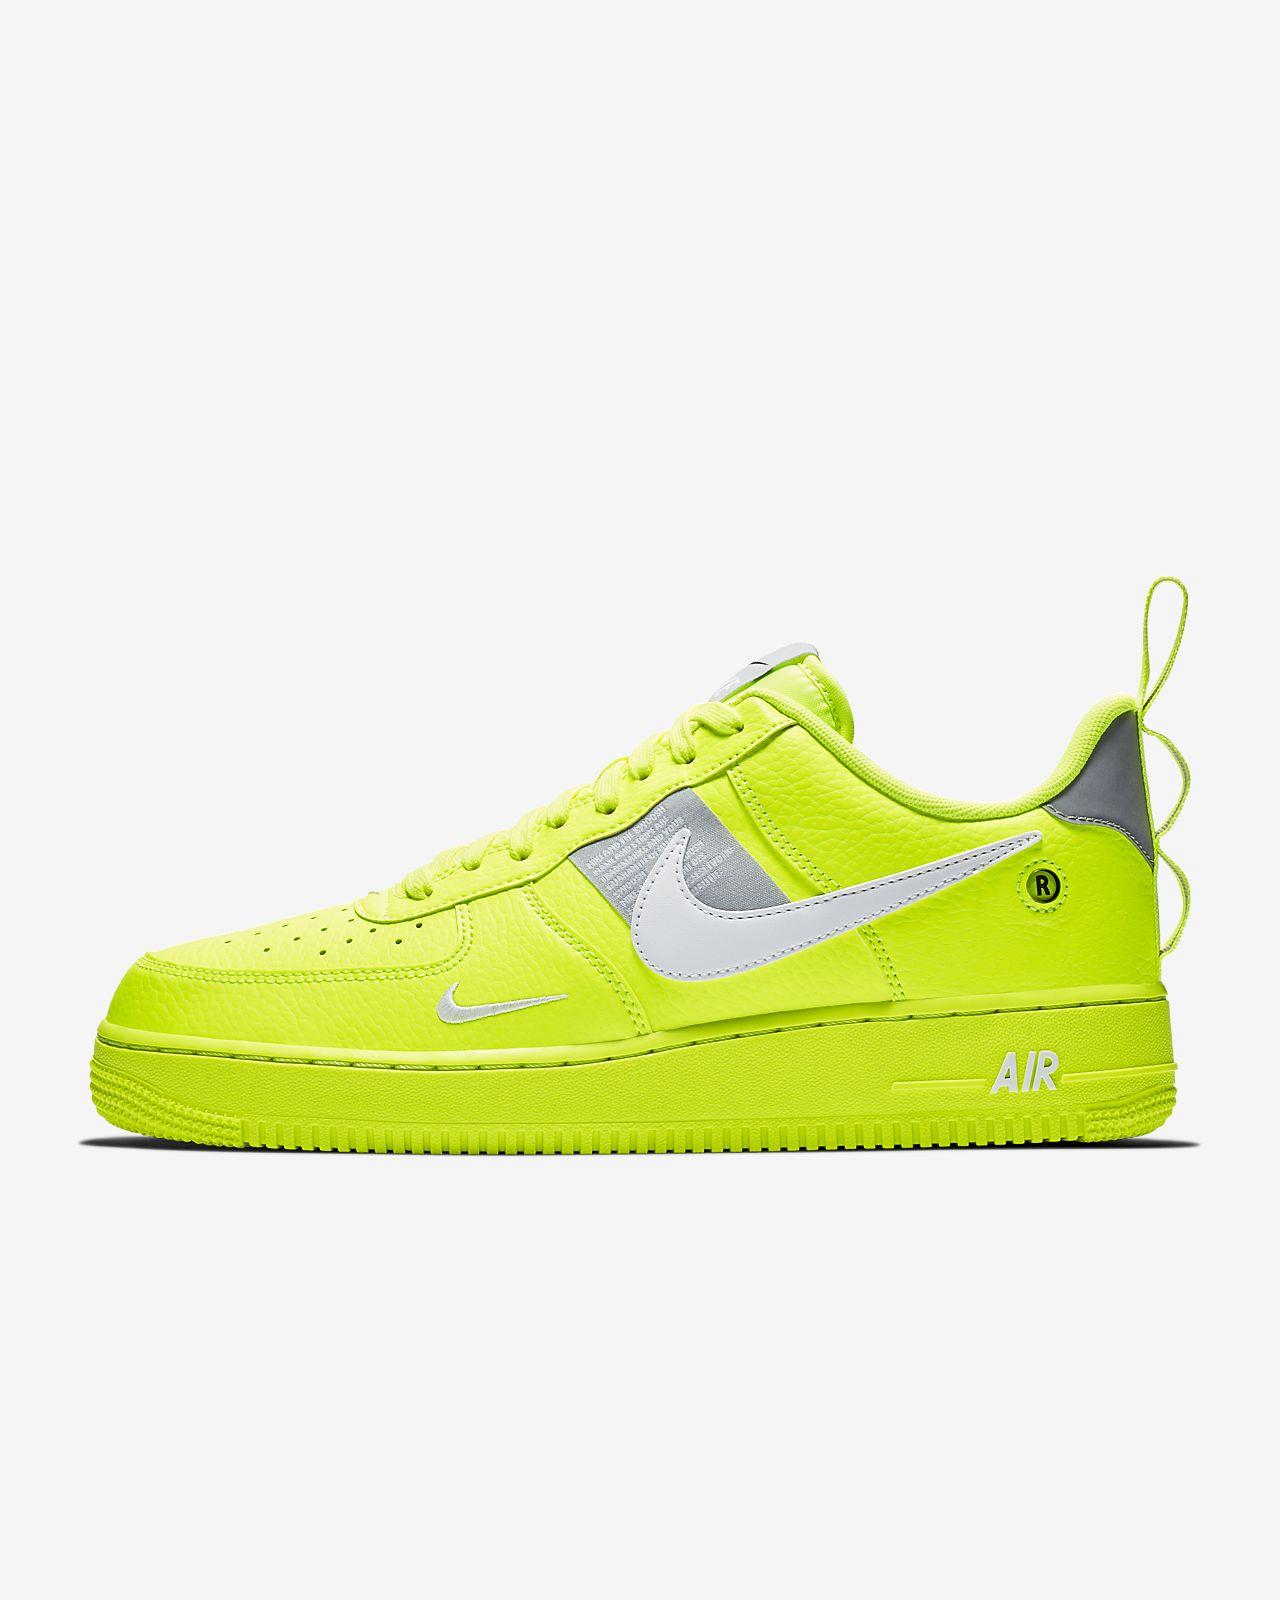 Be '07 Utility Force Lv8 Nike Air 1 Herrenschuh 5Xq0xwtTw